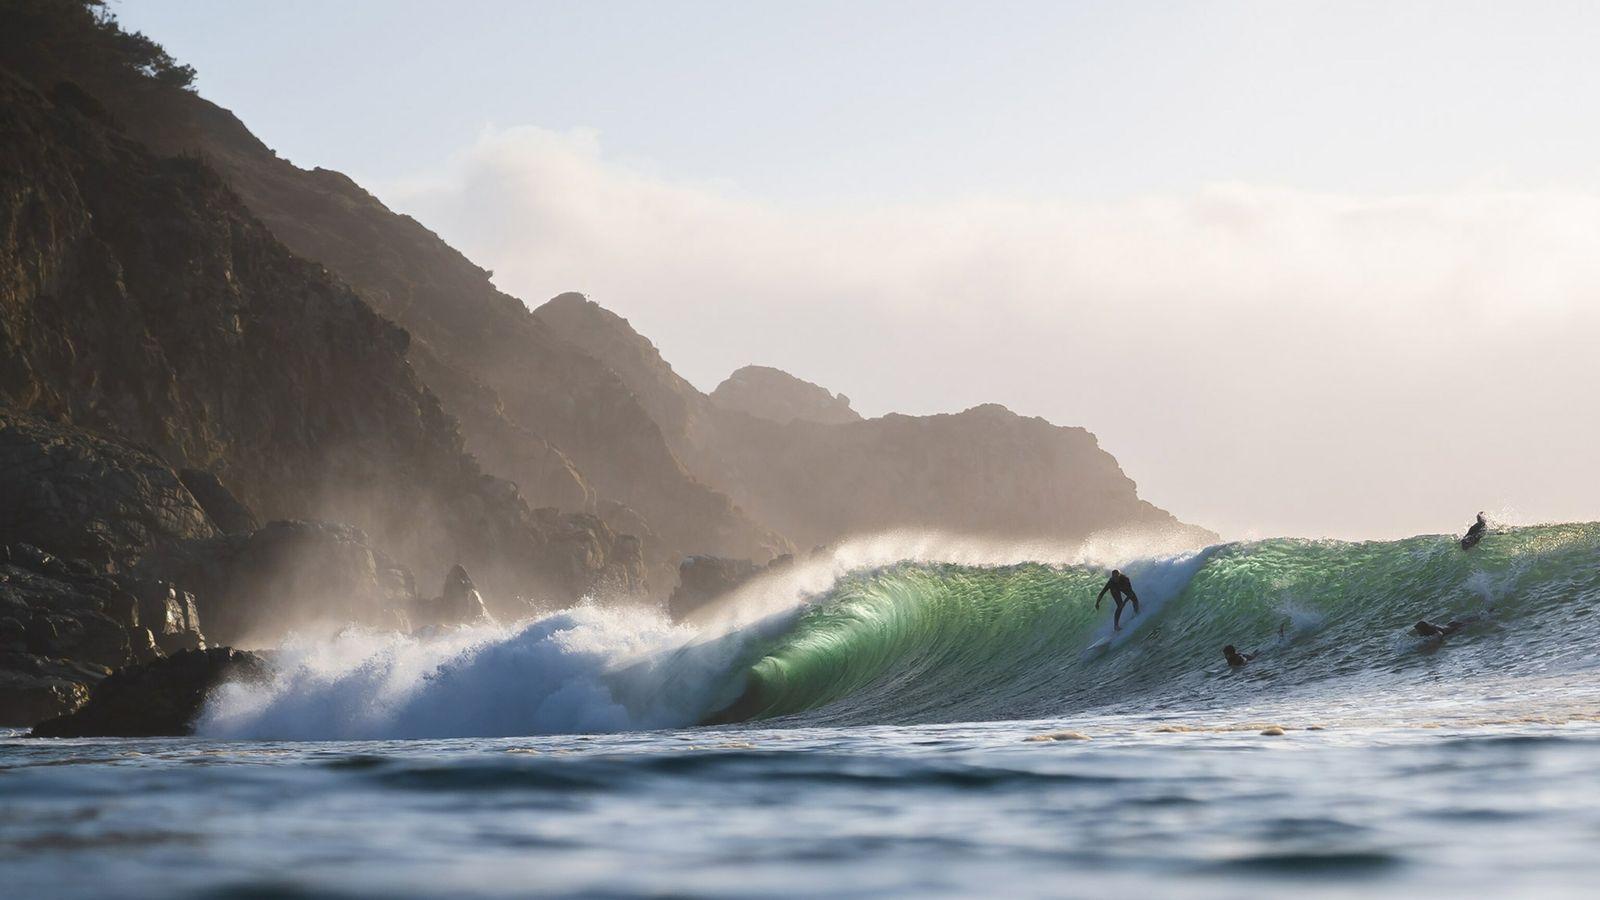 Chile surfing landscape